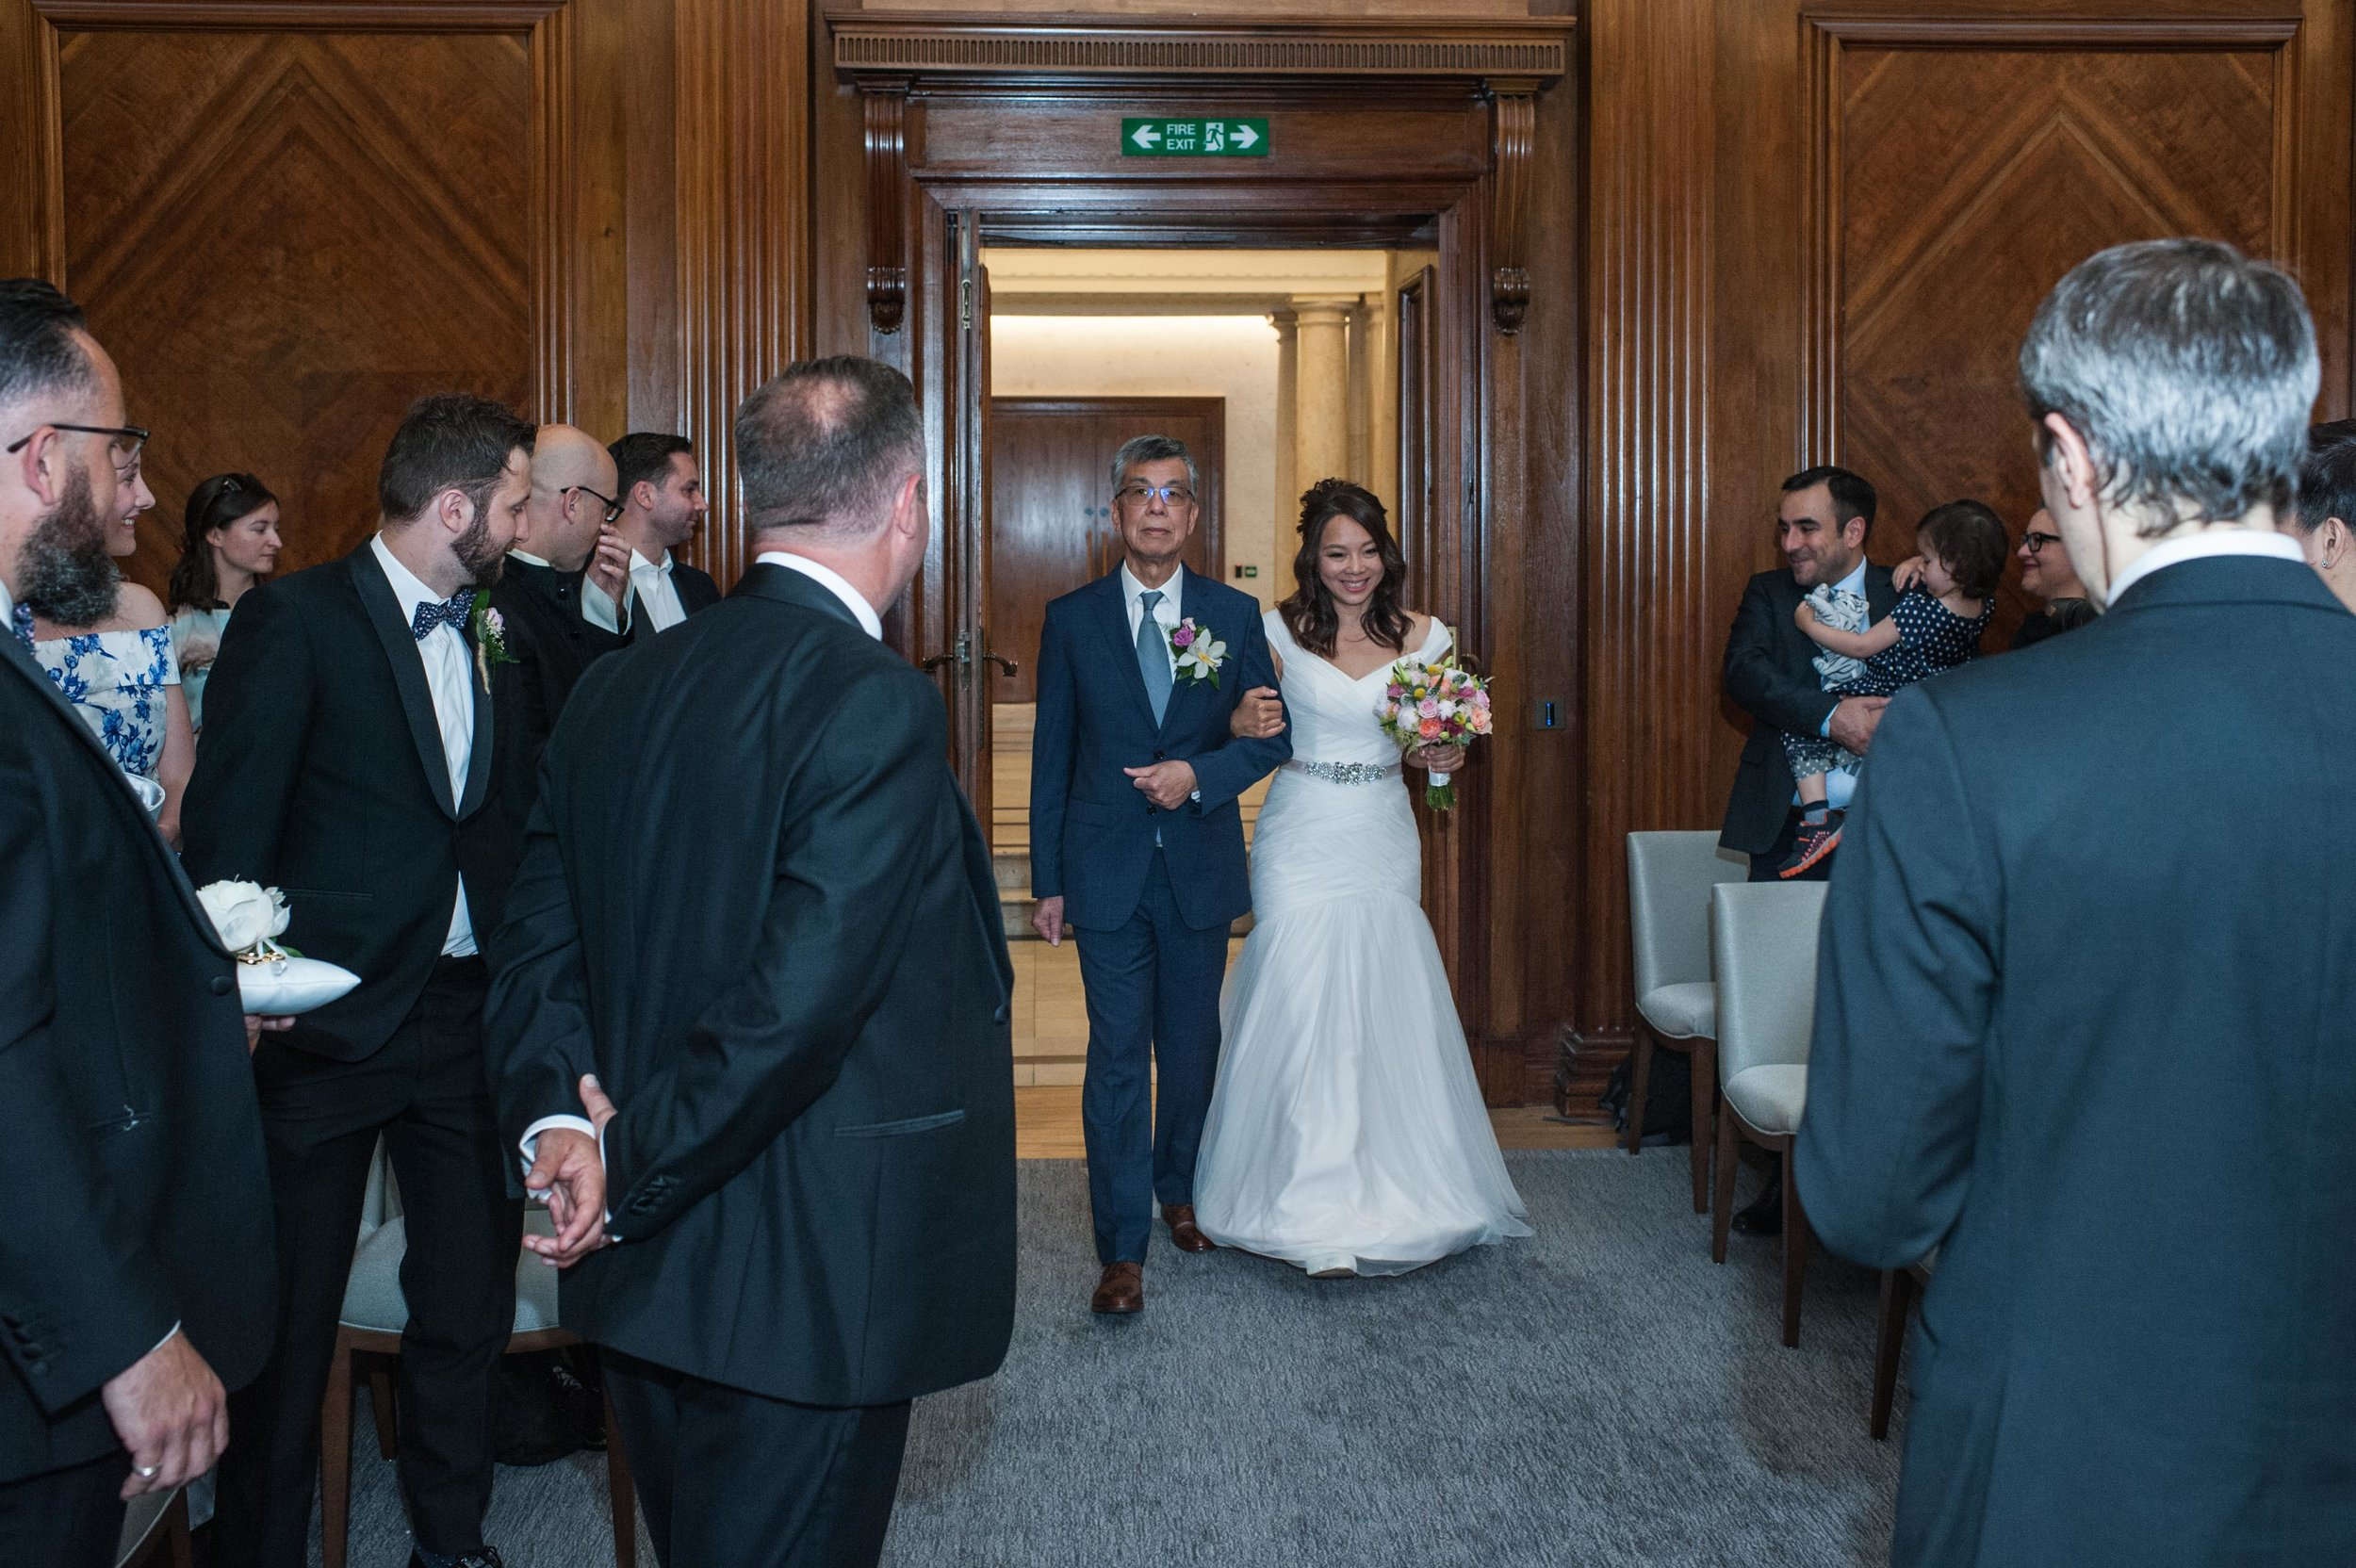 D&M_Marylebone Town Hall Wedding (89 of 239).jpg